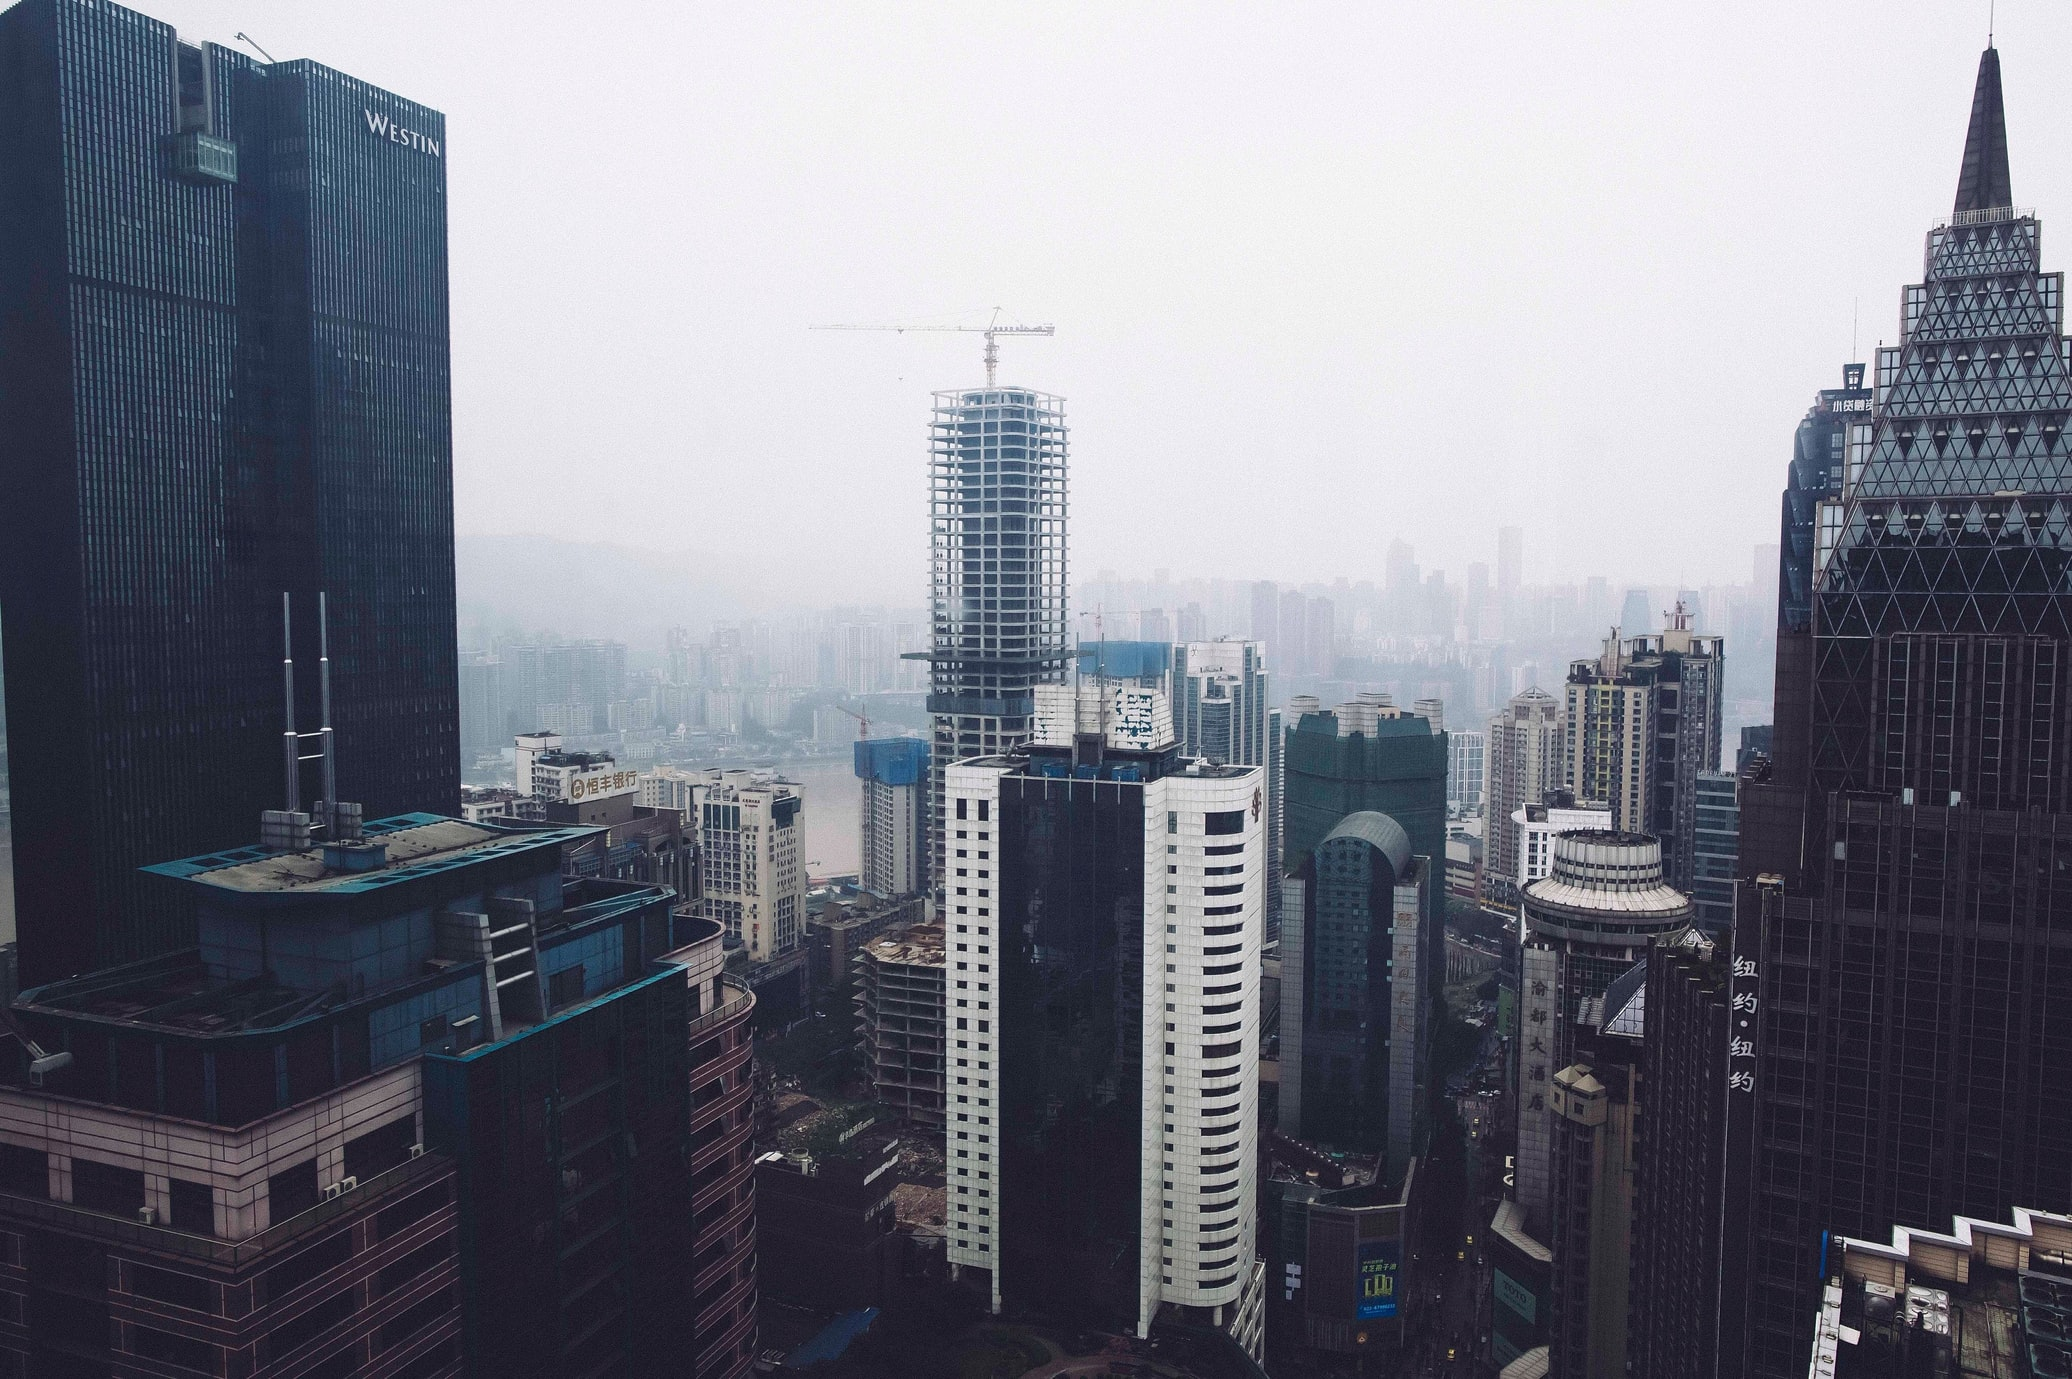 Buildings in Chongqing, China (Jon Grogan via Unsplash)